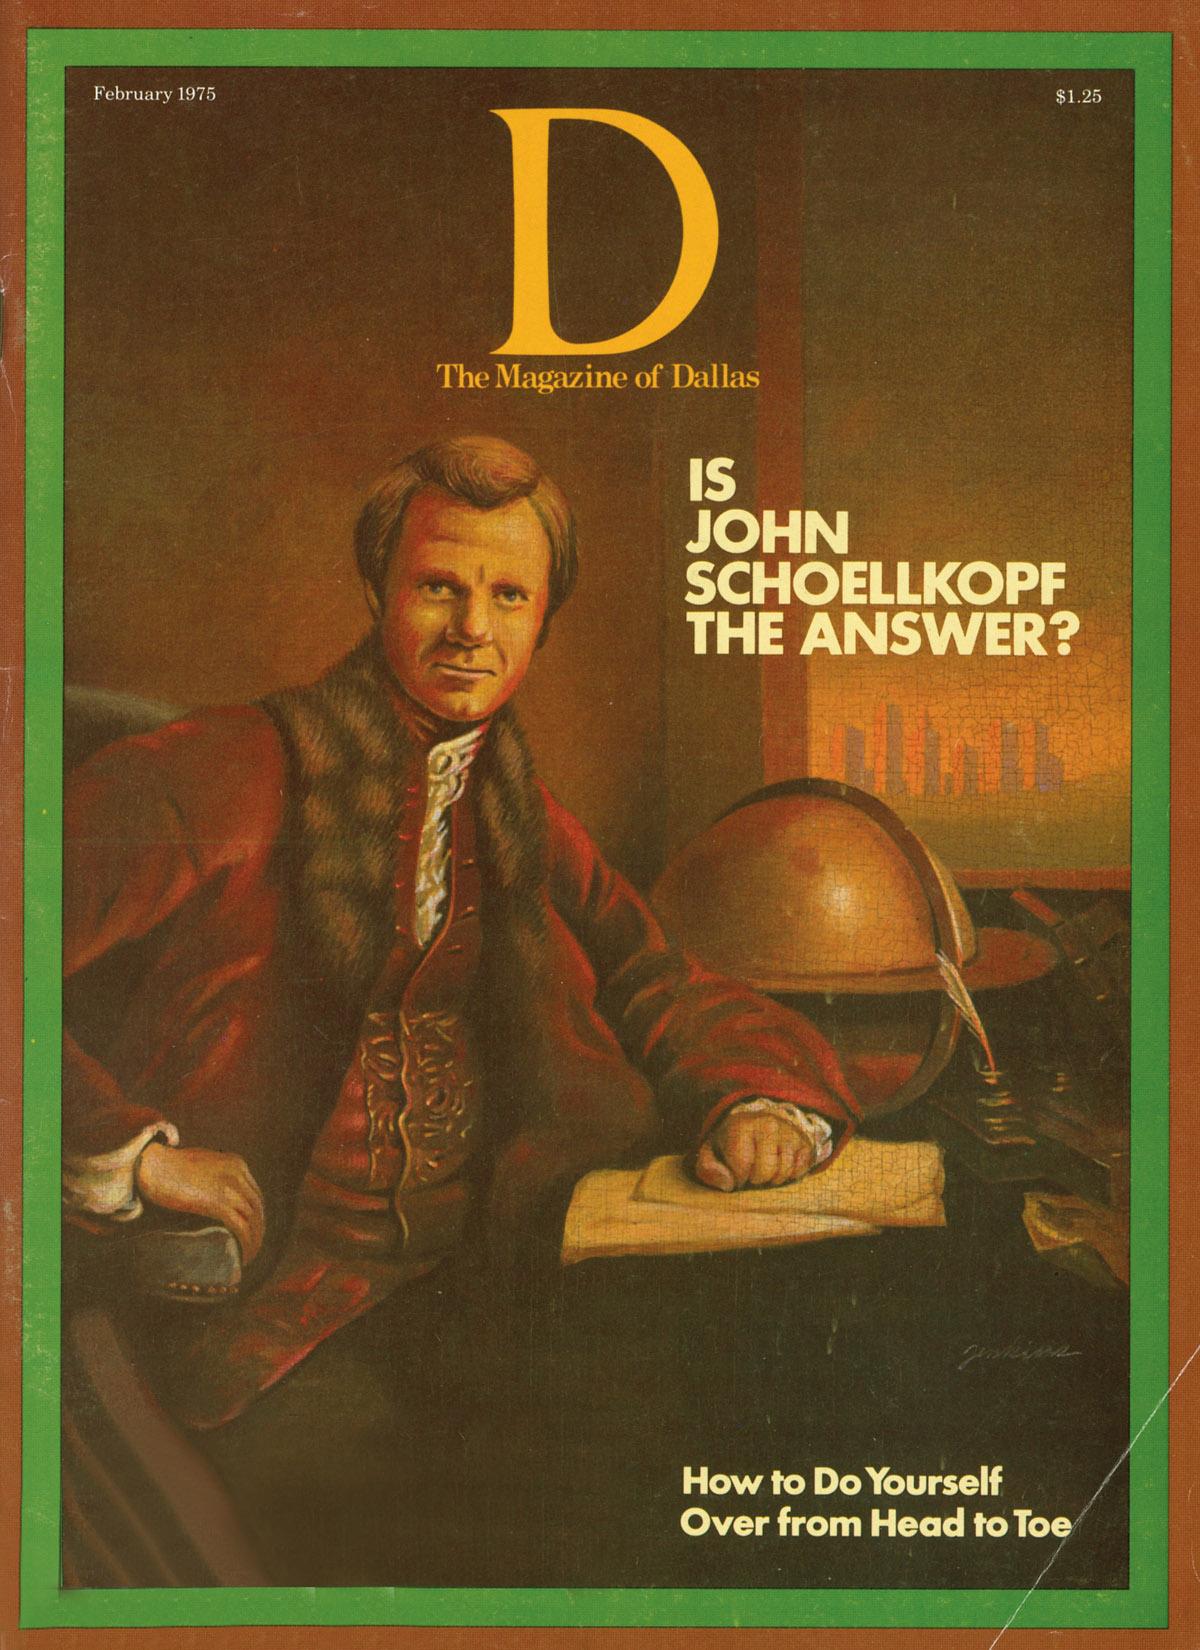 February 1975 cover